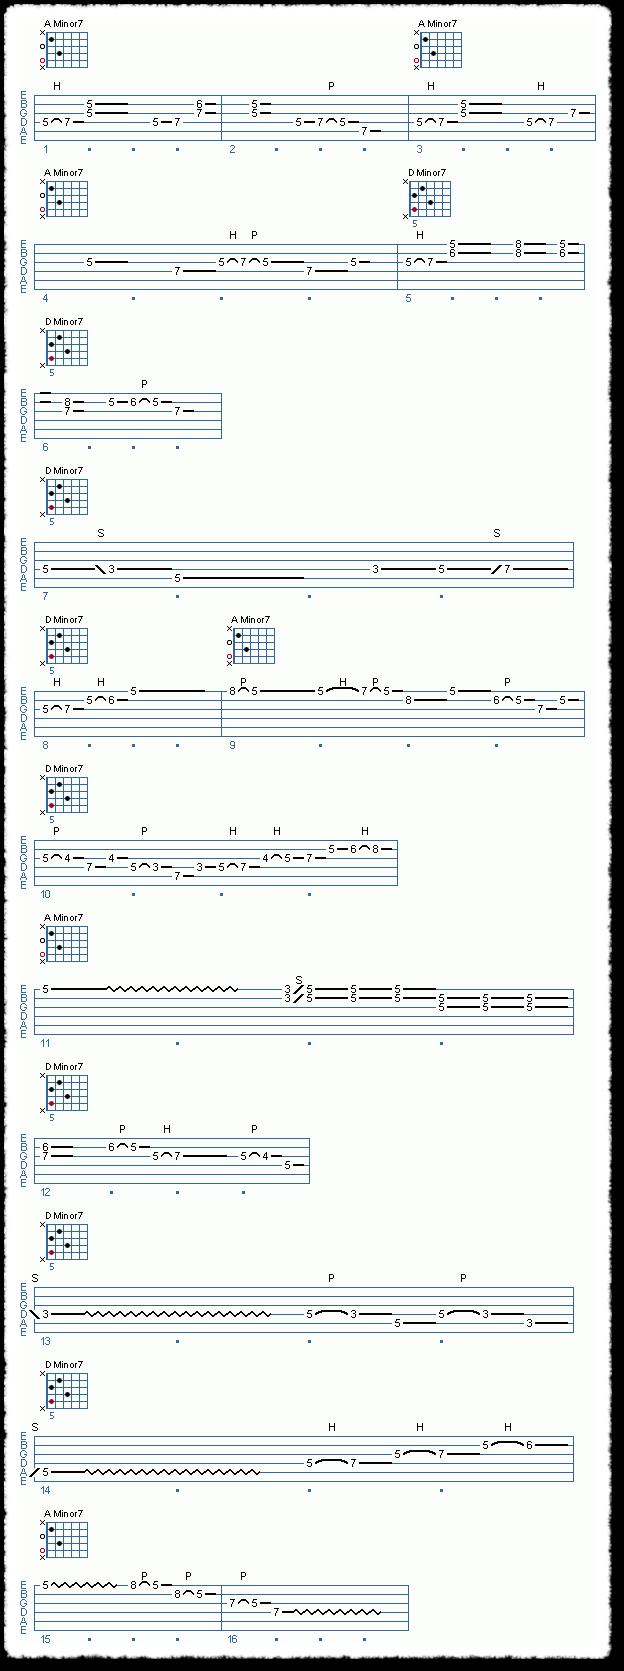 Chord Shape Improvisation, Part 1 - Page 9